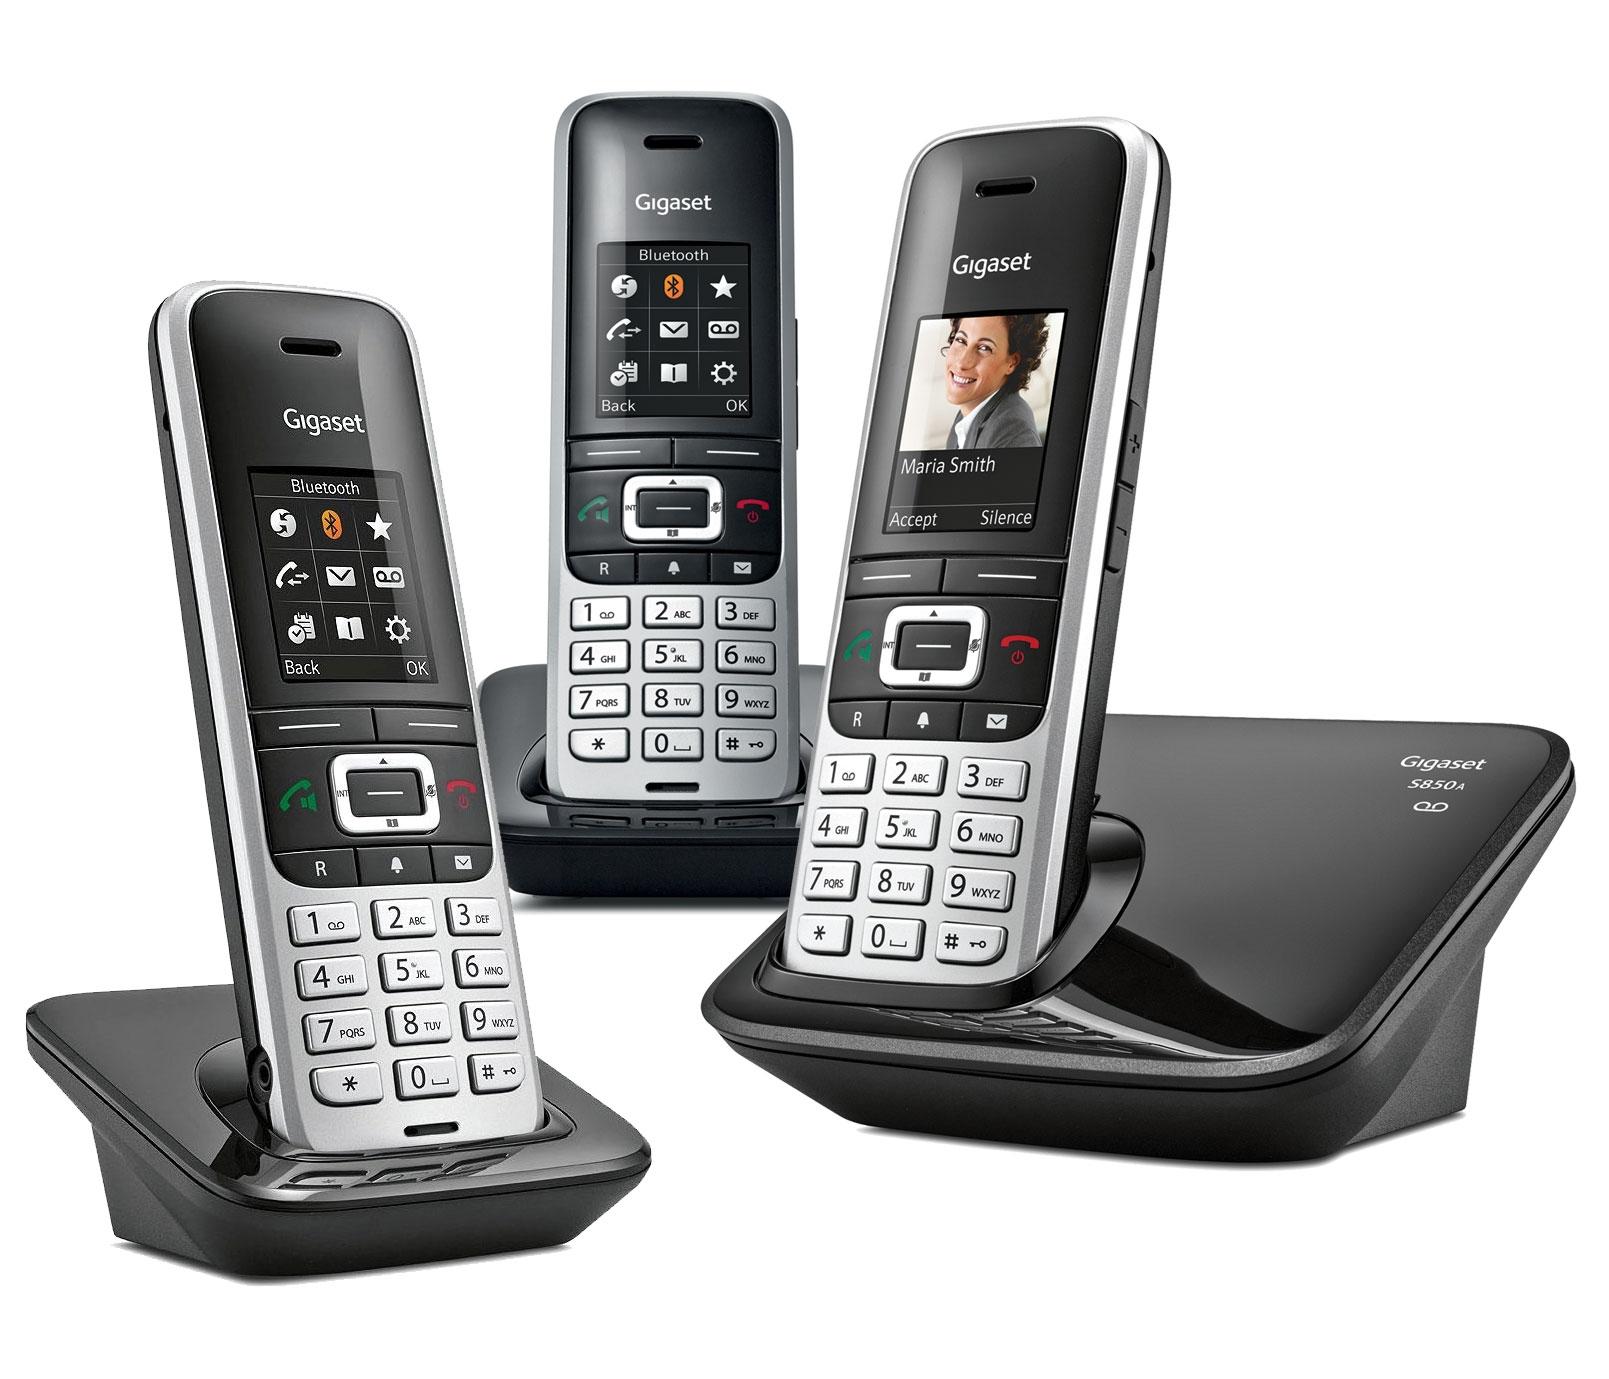 Image of Siemens Gigaset Premium S850A Cordless Phone, Trio Handset with Answer Machine